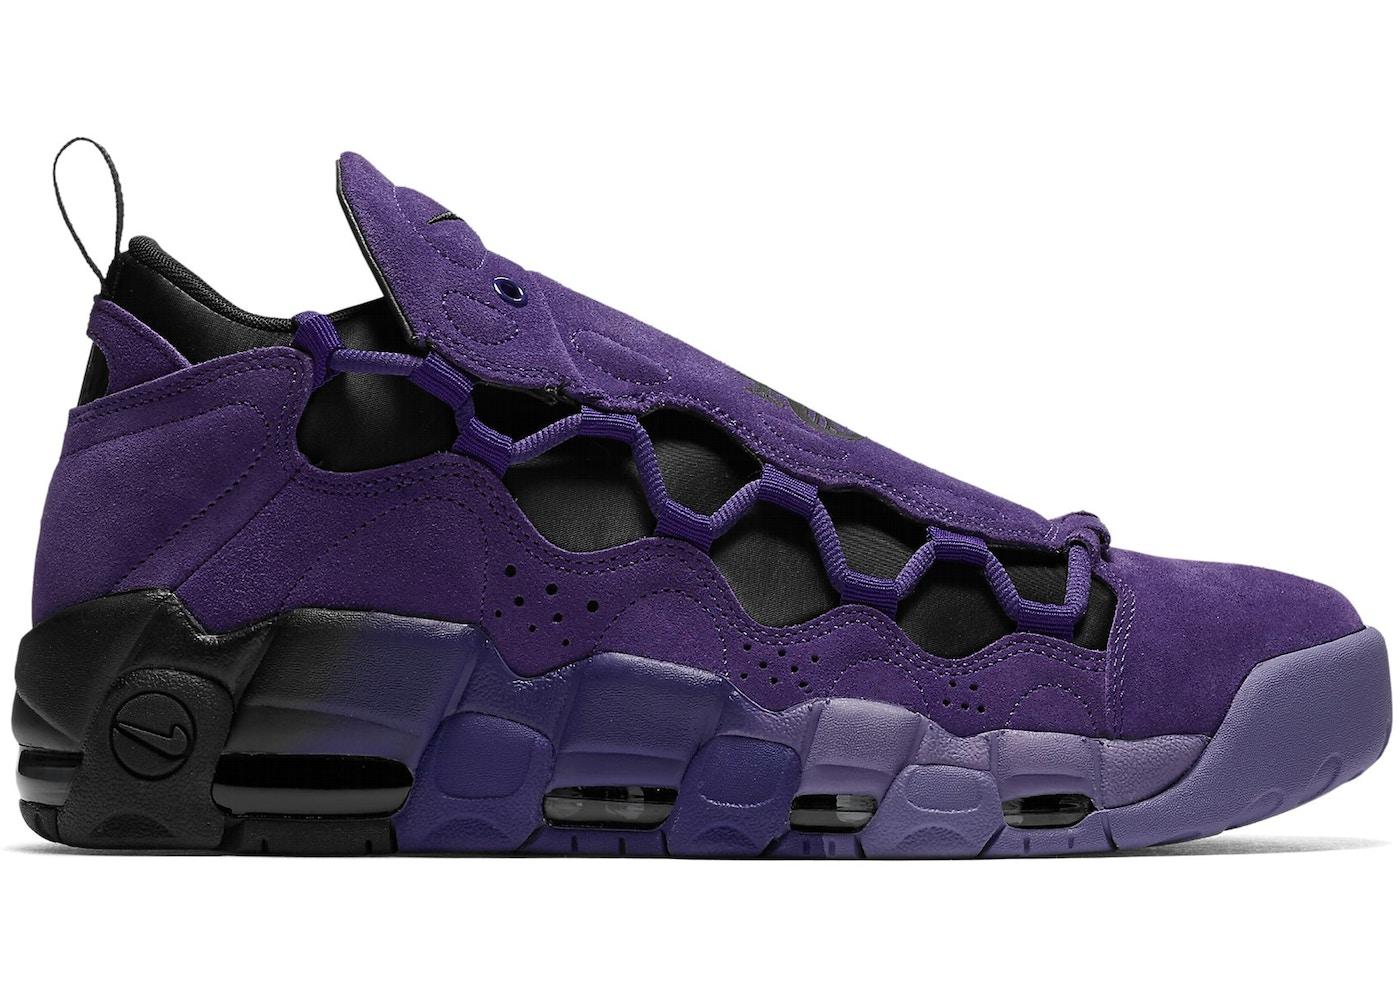 11443885f6b8 Air More Money Court Purple - AQ2177-500